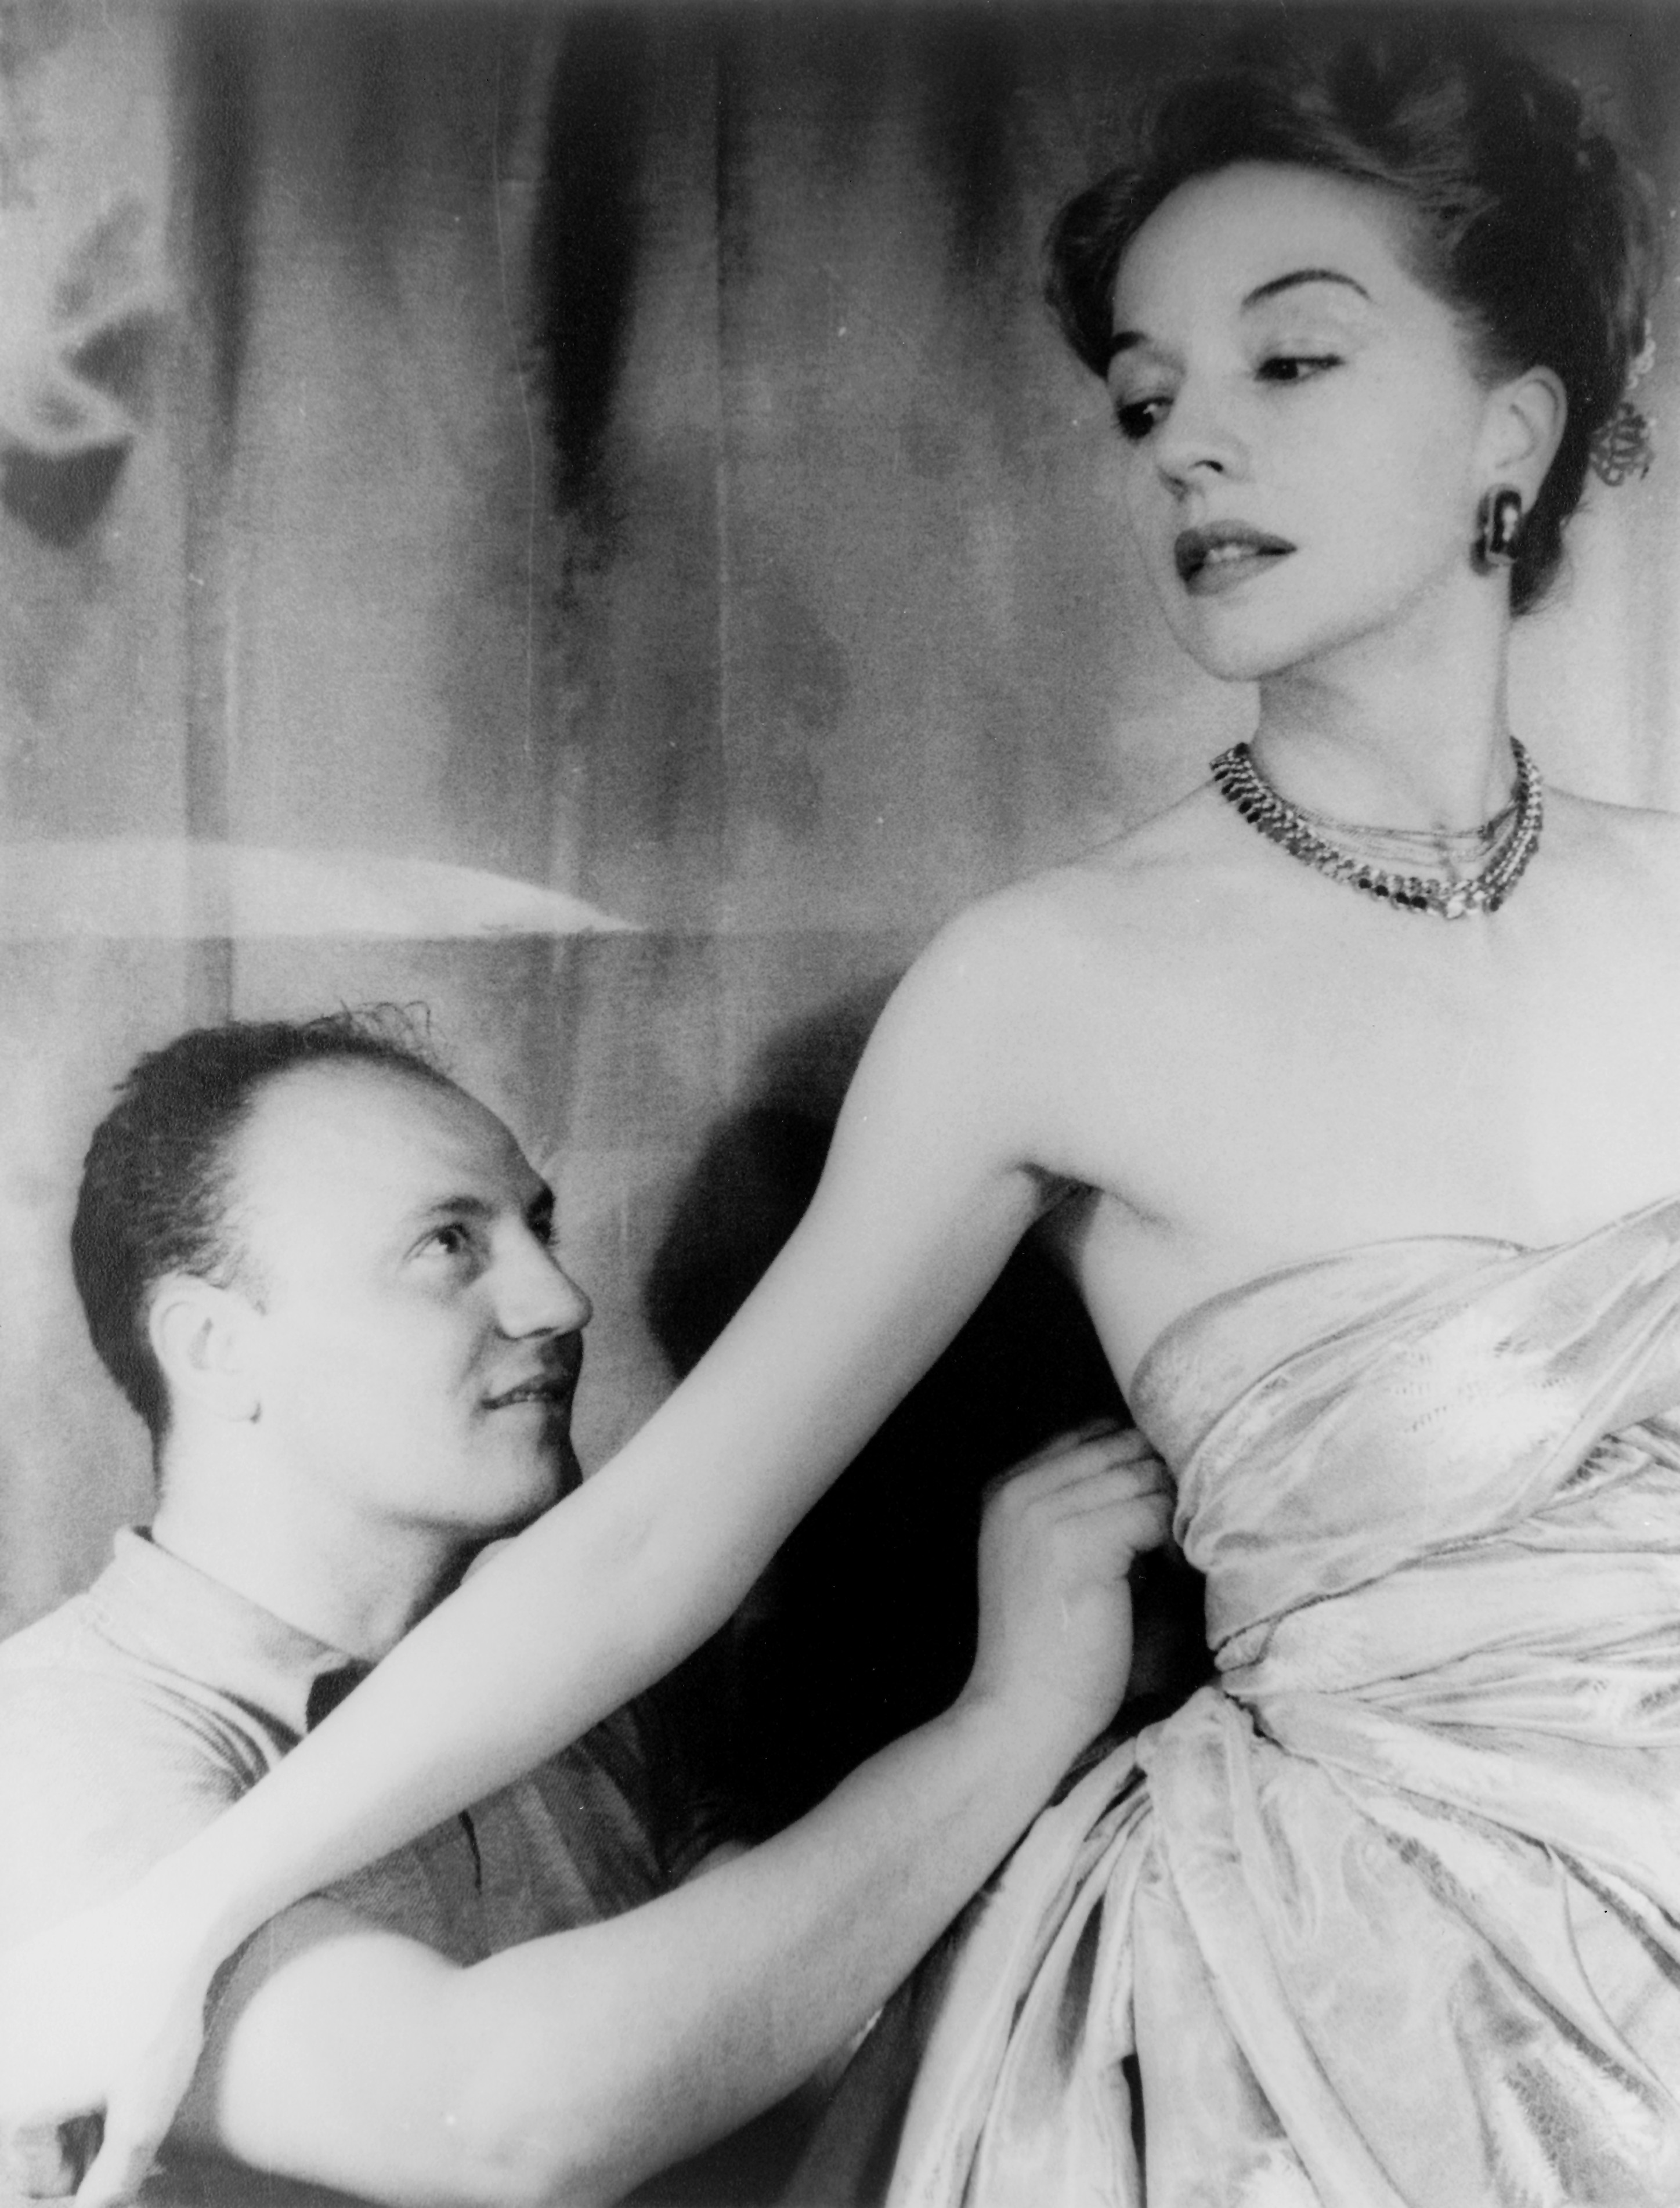 Fashion designer Pierre Balmain fitting haute couture gown on actress Ruth Ford, 1947 - Balmain Paris